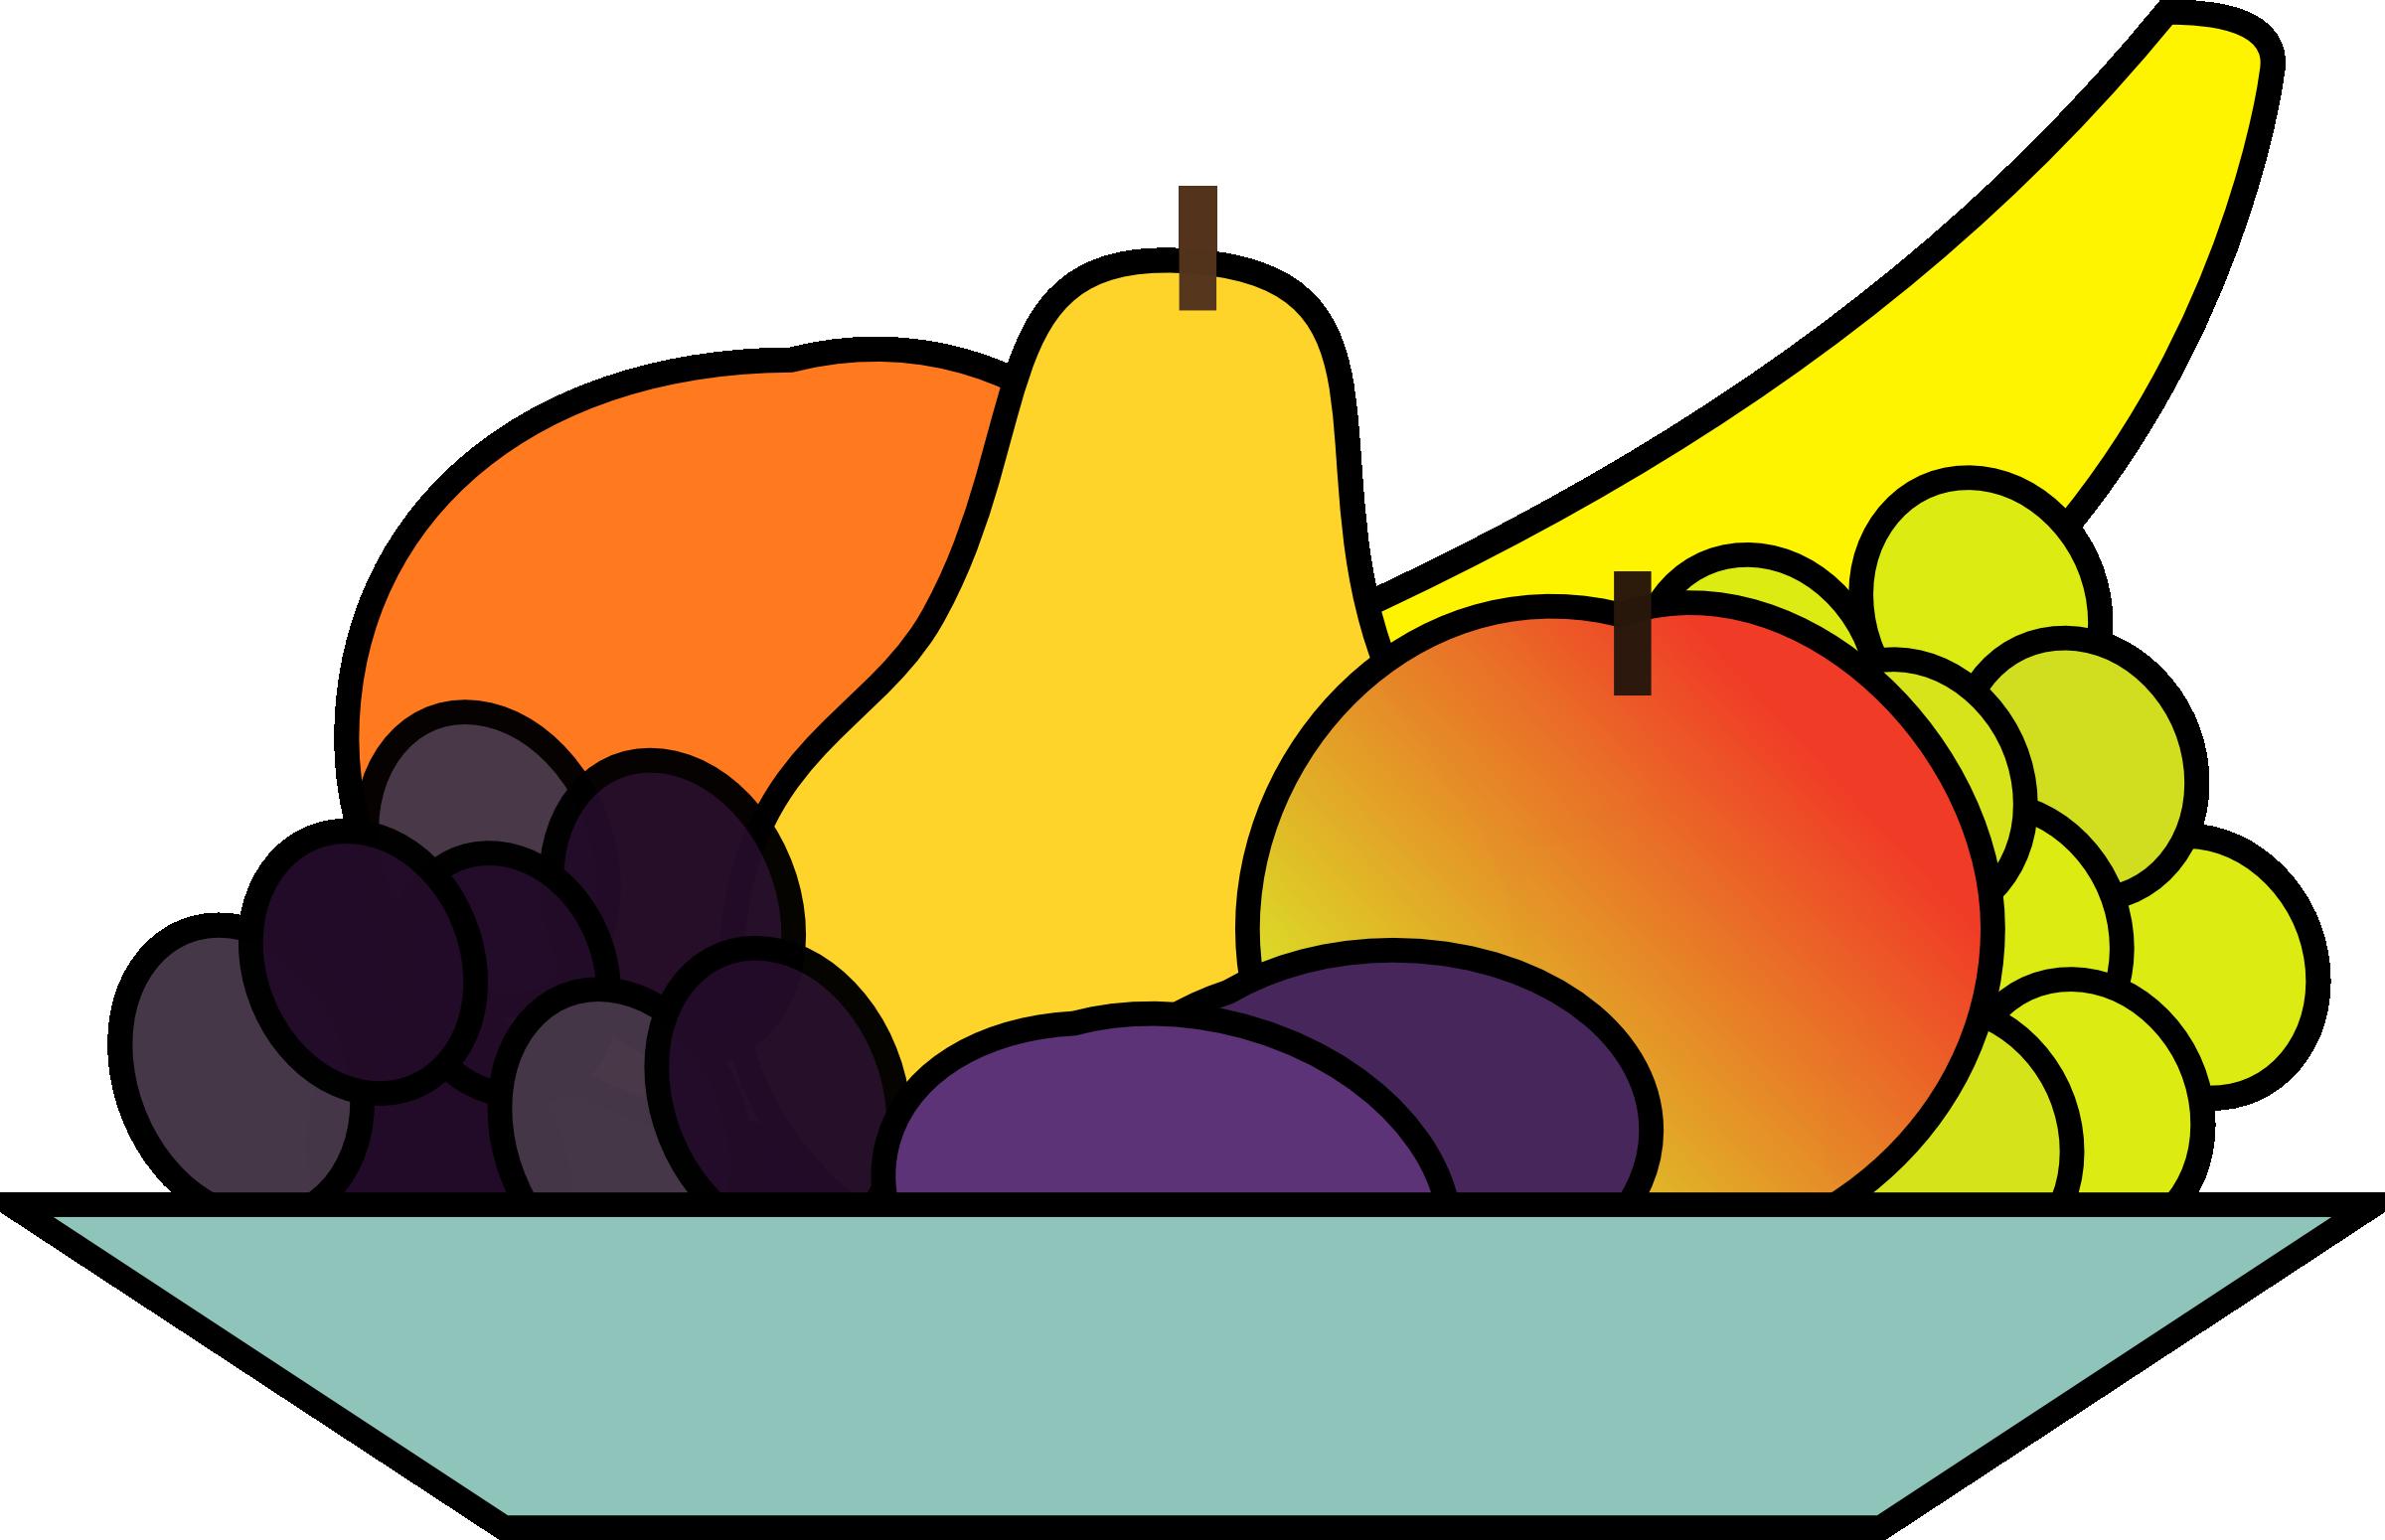 Plate clipart plate bowls Fruit Plate Clipart Clipart Panda